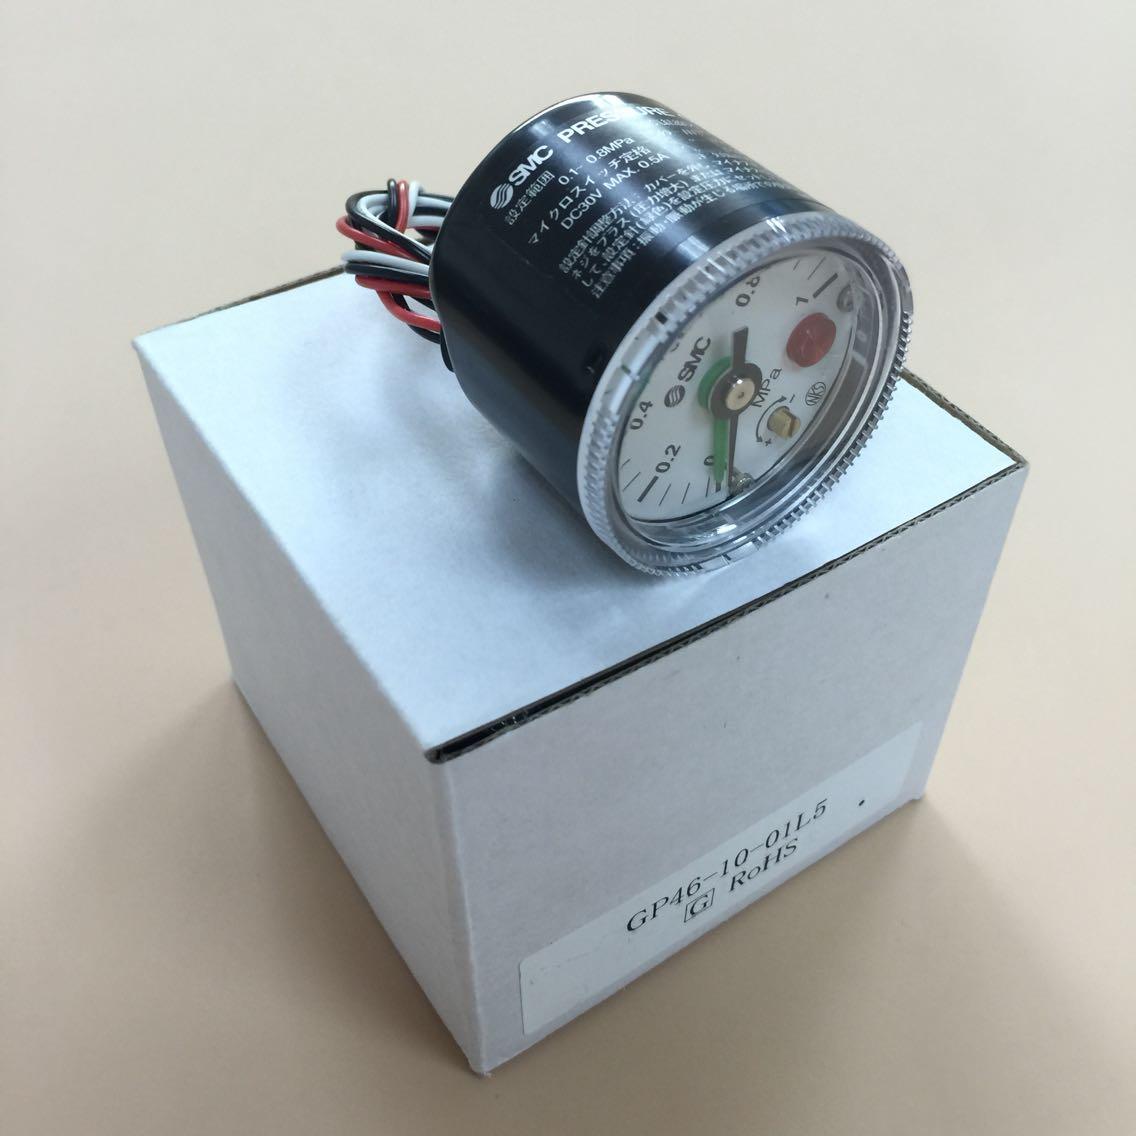 Original SMC Pressure Gauge GP46-10-01L5 GP46-10-01L2 GP46-10-02L5 GP46-10-02L2 te5000 0 3kpa pressure gauge